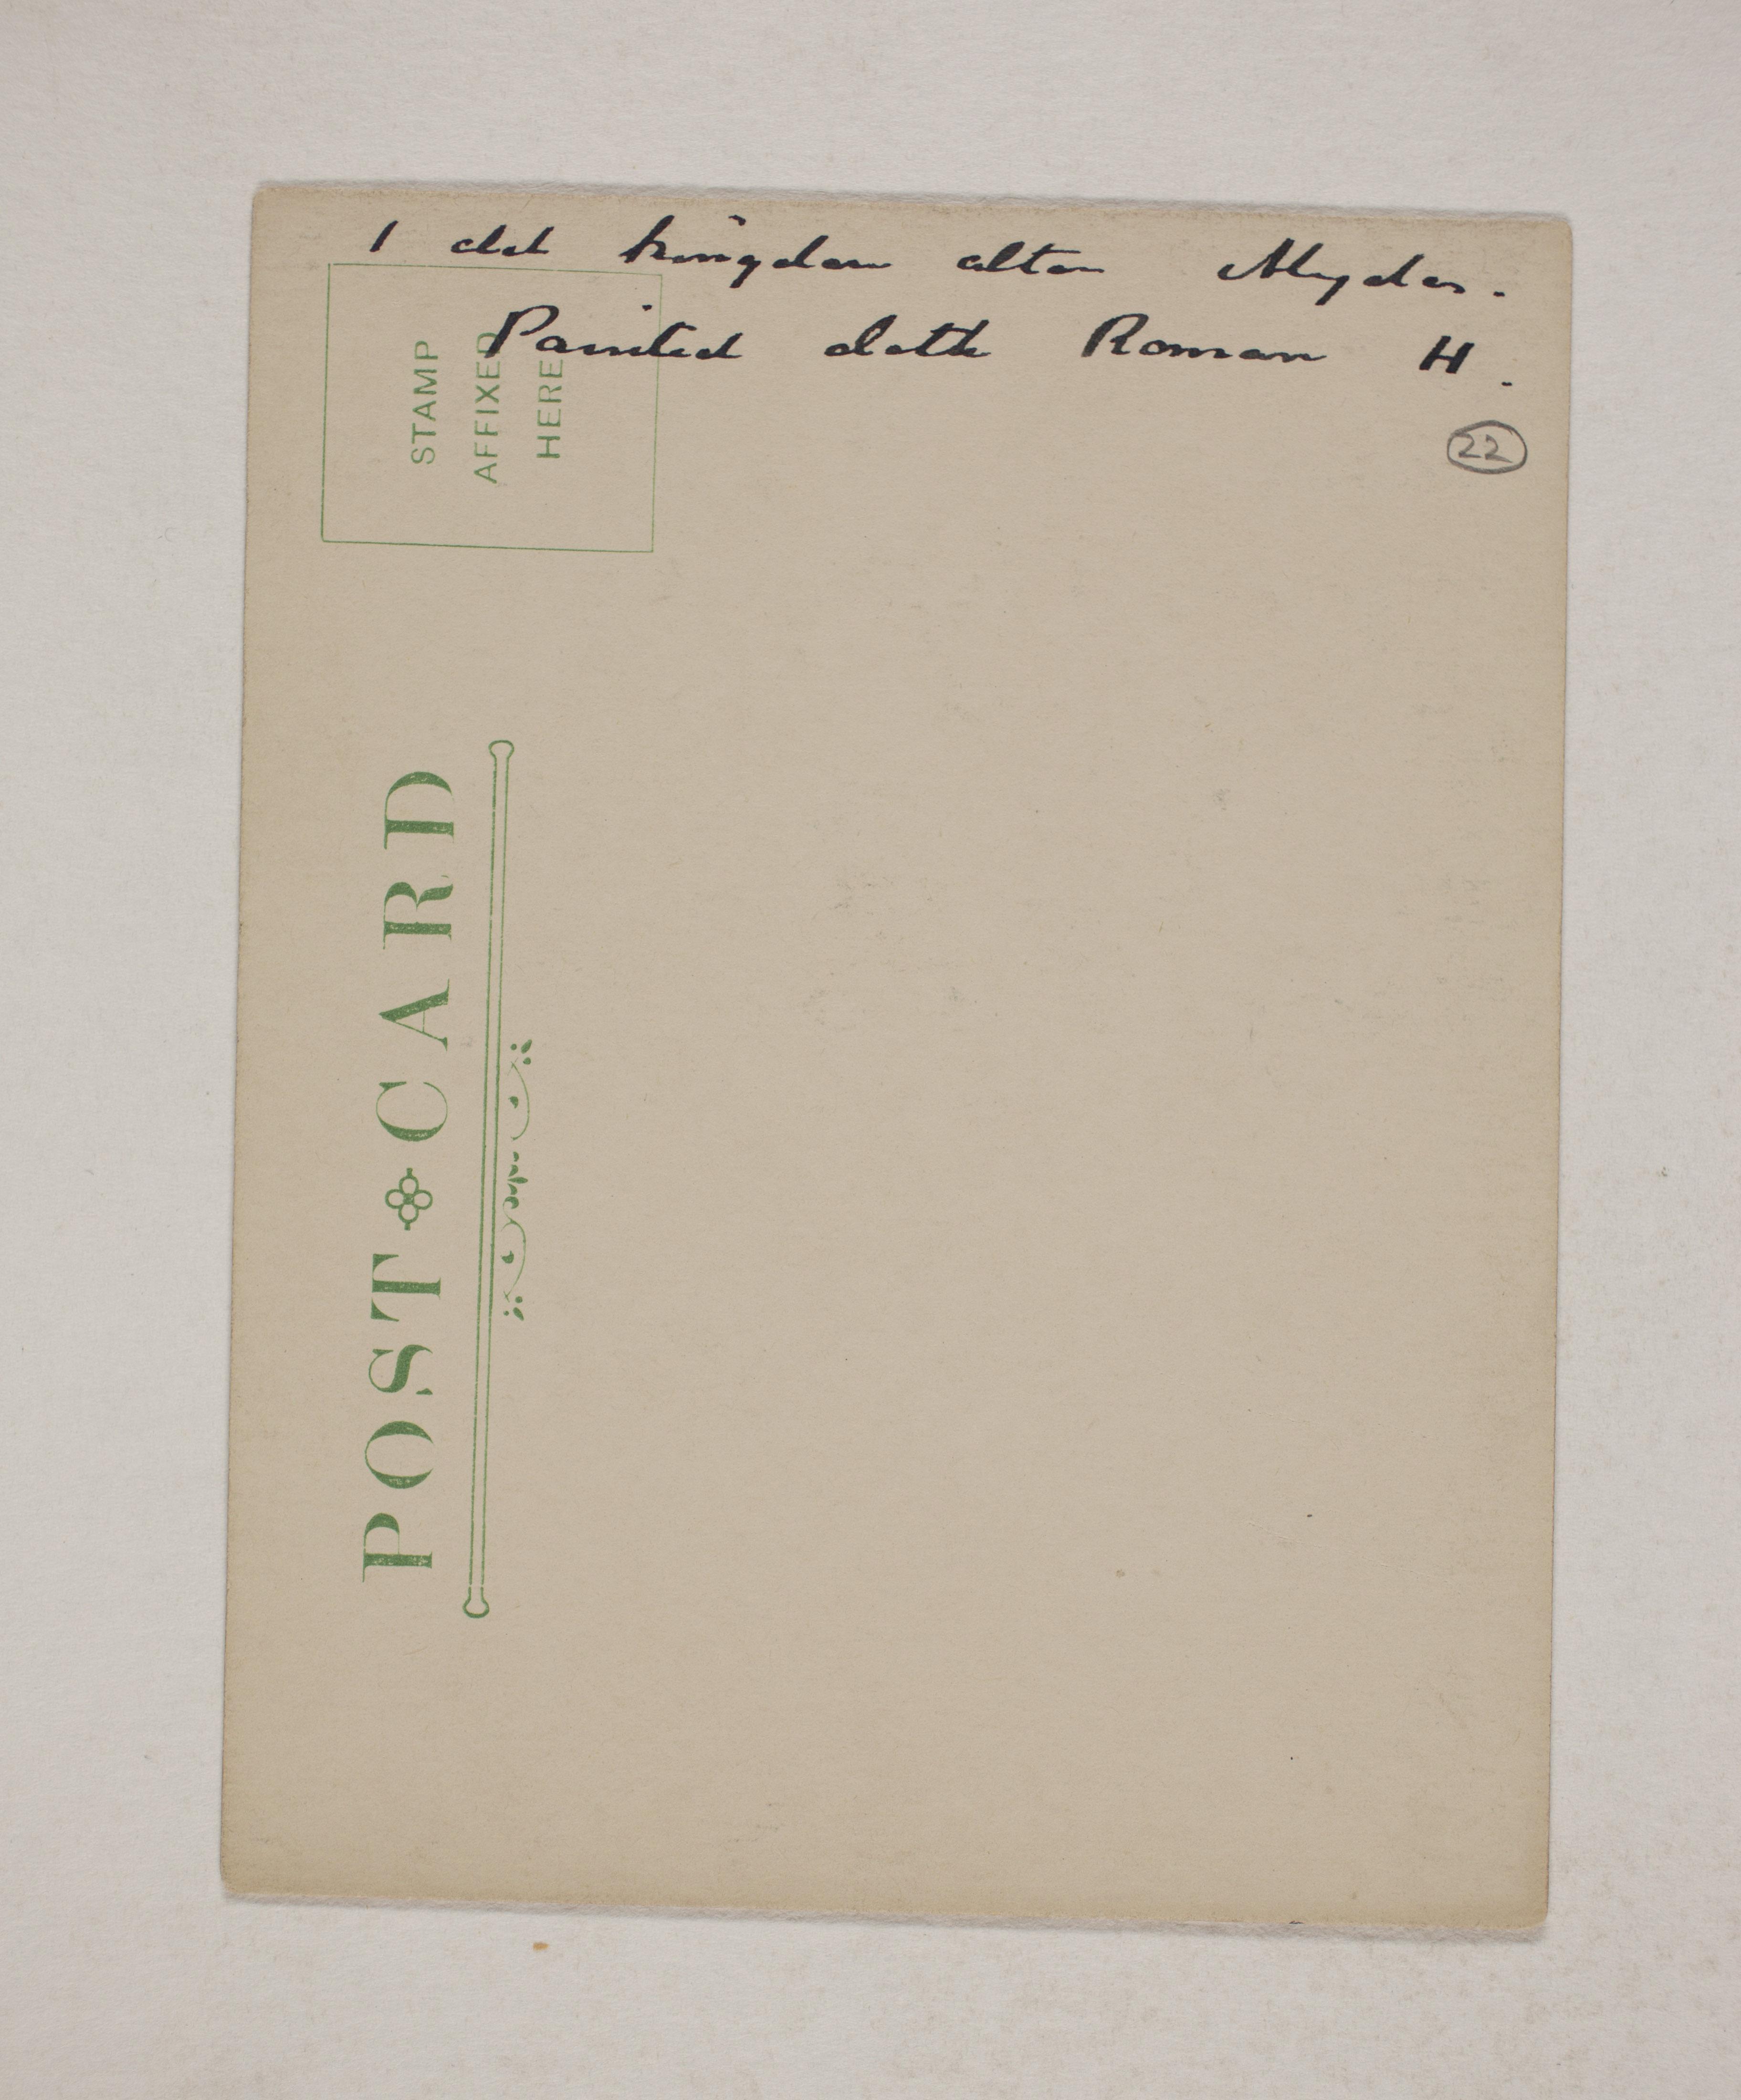 1910-11 Hawara, Gerzeh, Memphis, Mazghuneh Individual institution list  PMA/WFP1/D/19/22.2